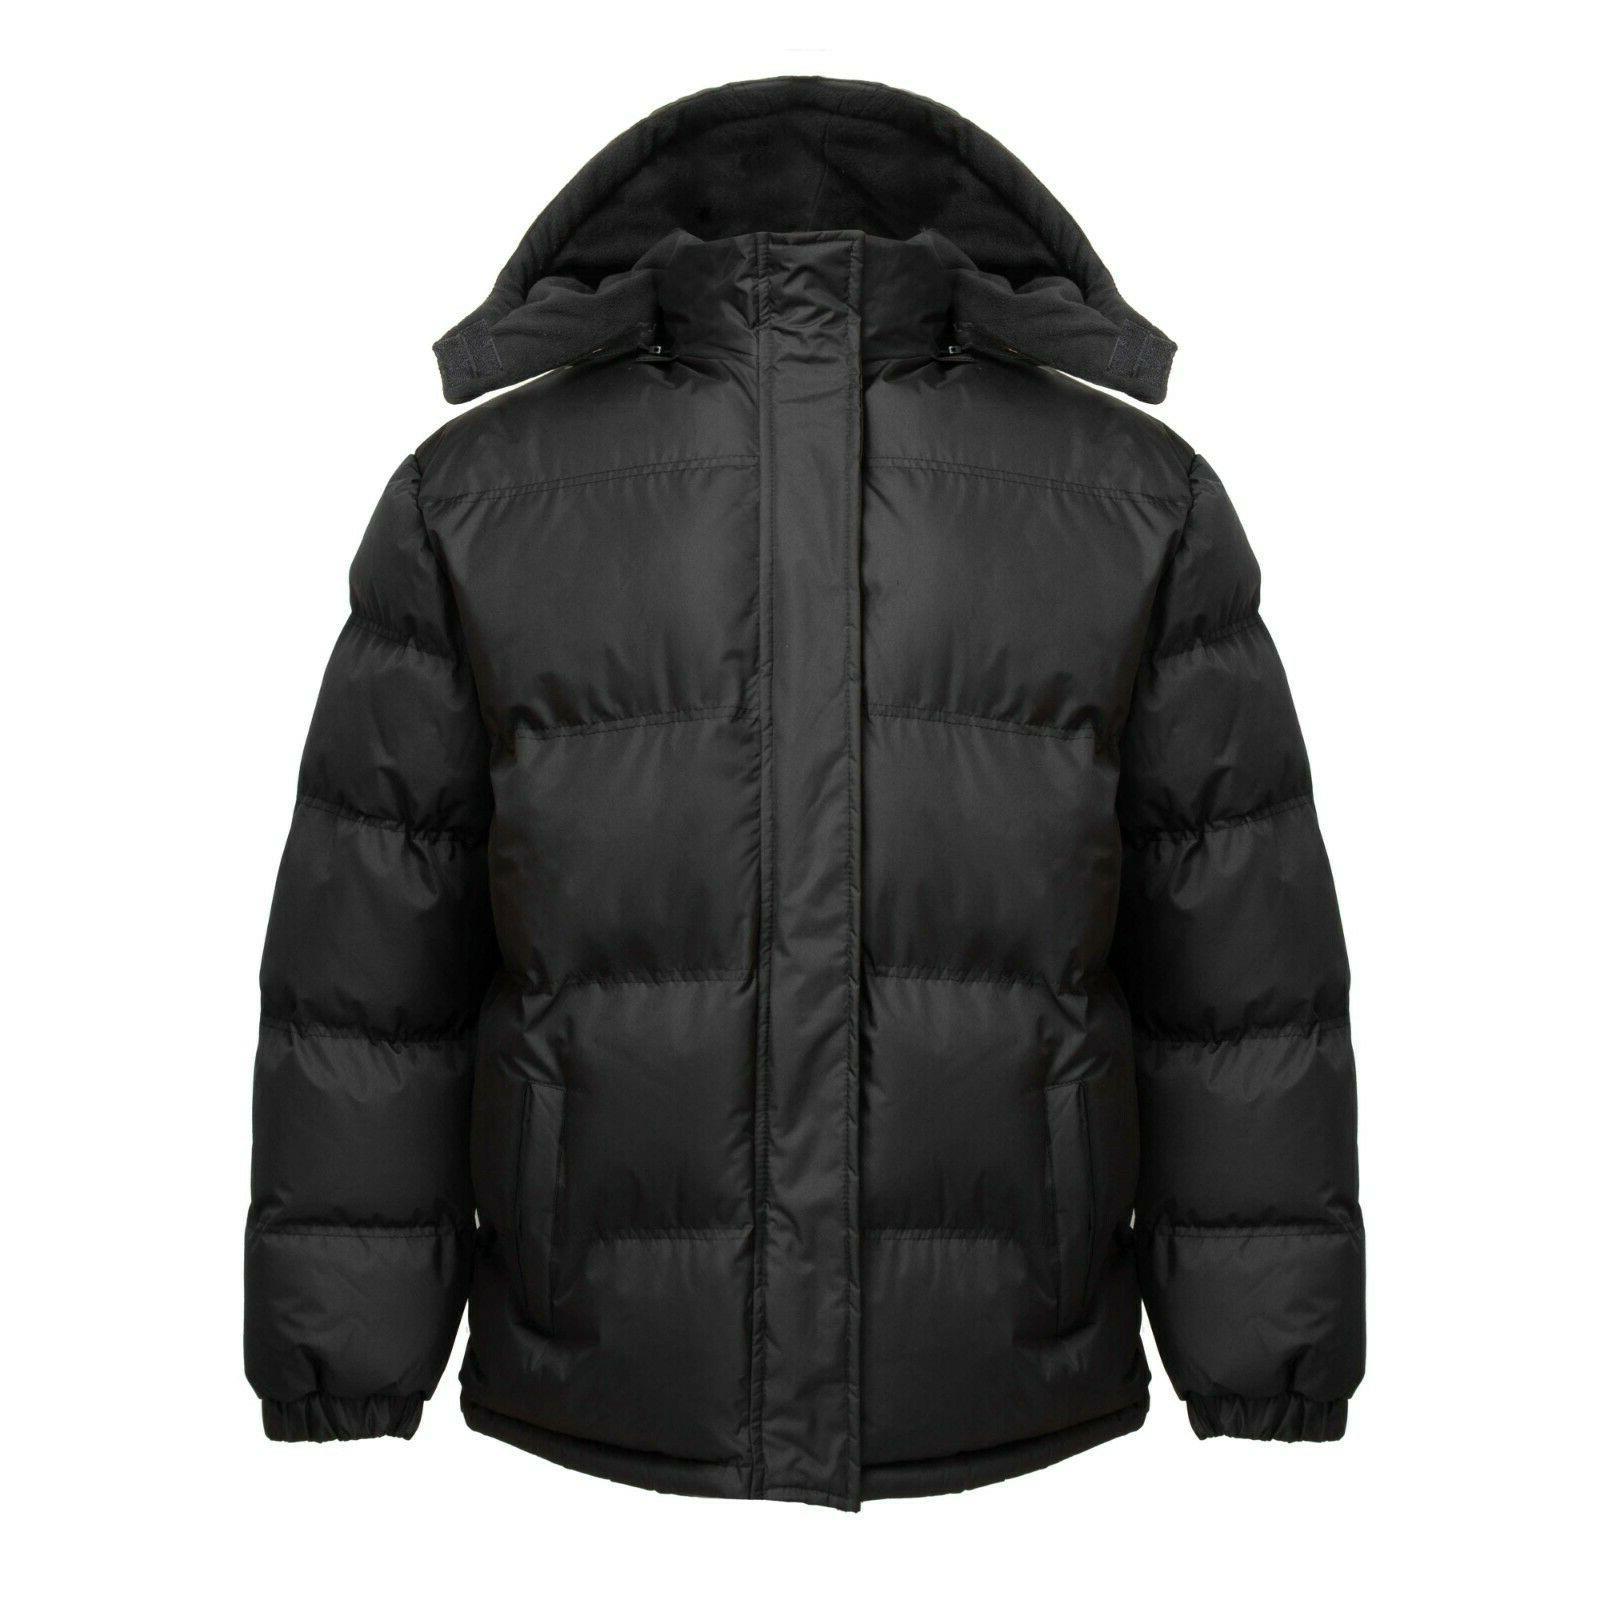 nwt mens warm puffer jacket bubble coat